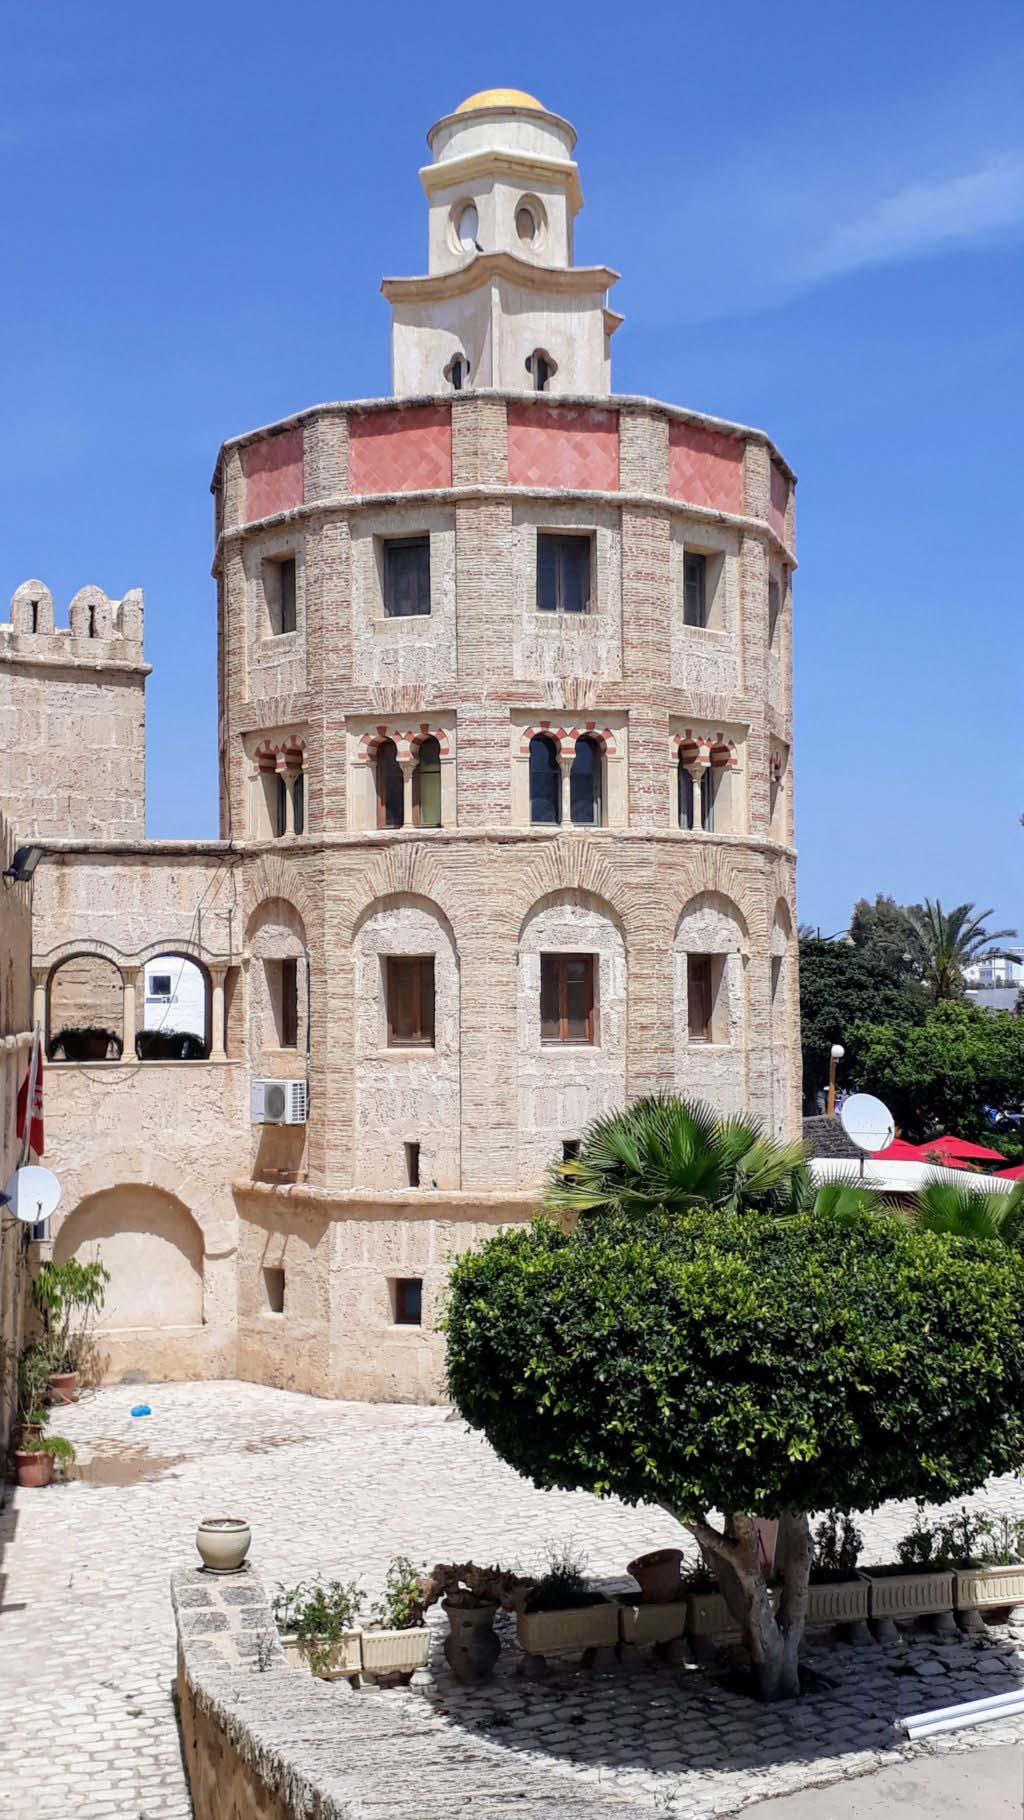 Tour d'Or in the Medina Mediterranea